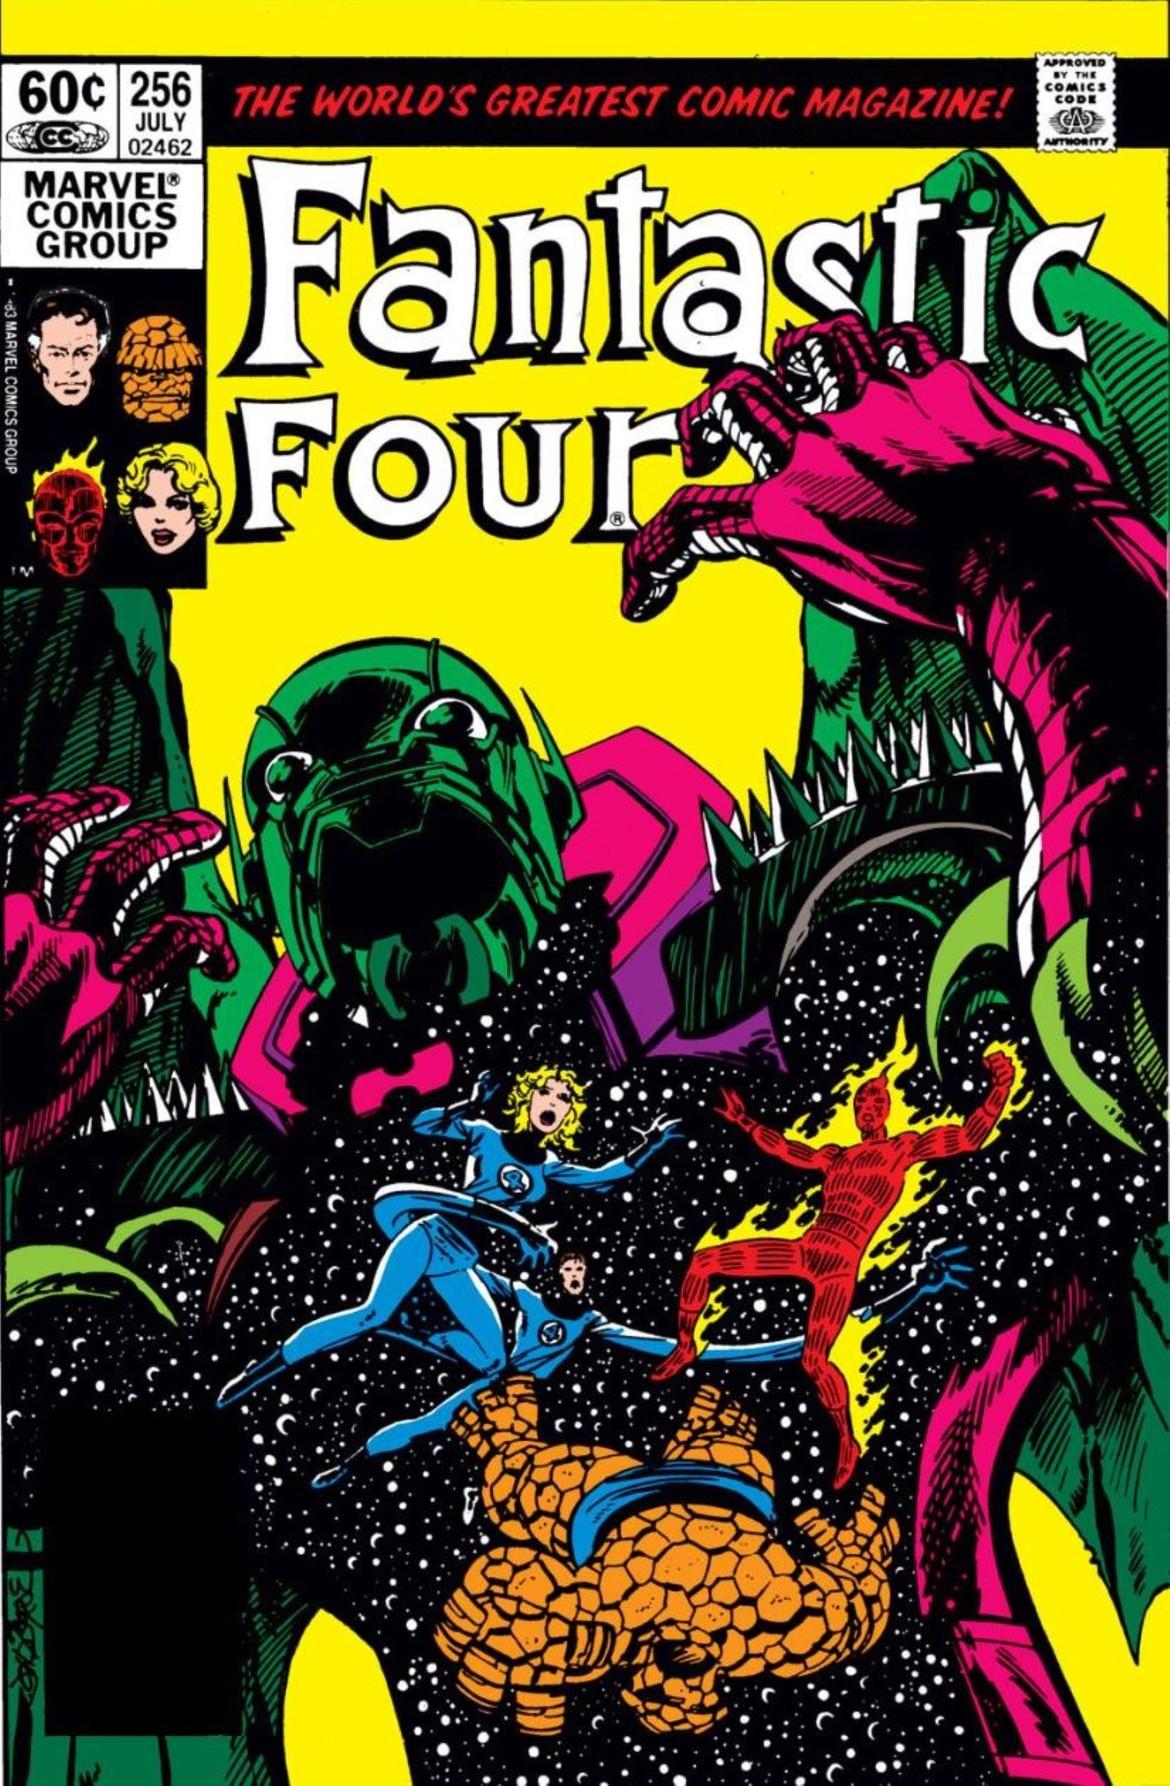 Fantastic Four 256 (Custom).JPG